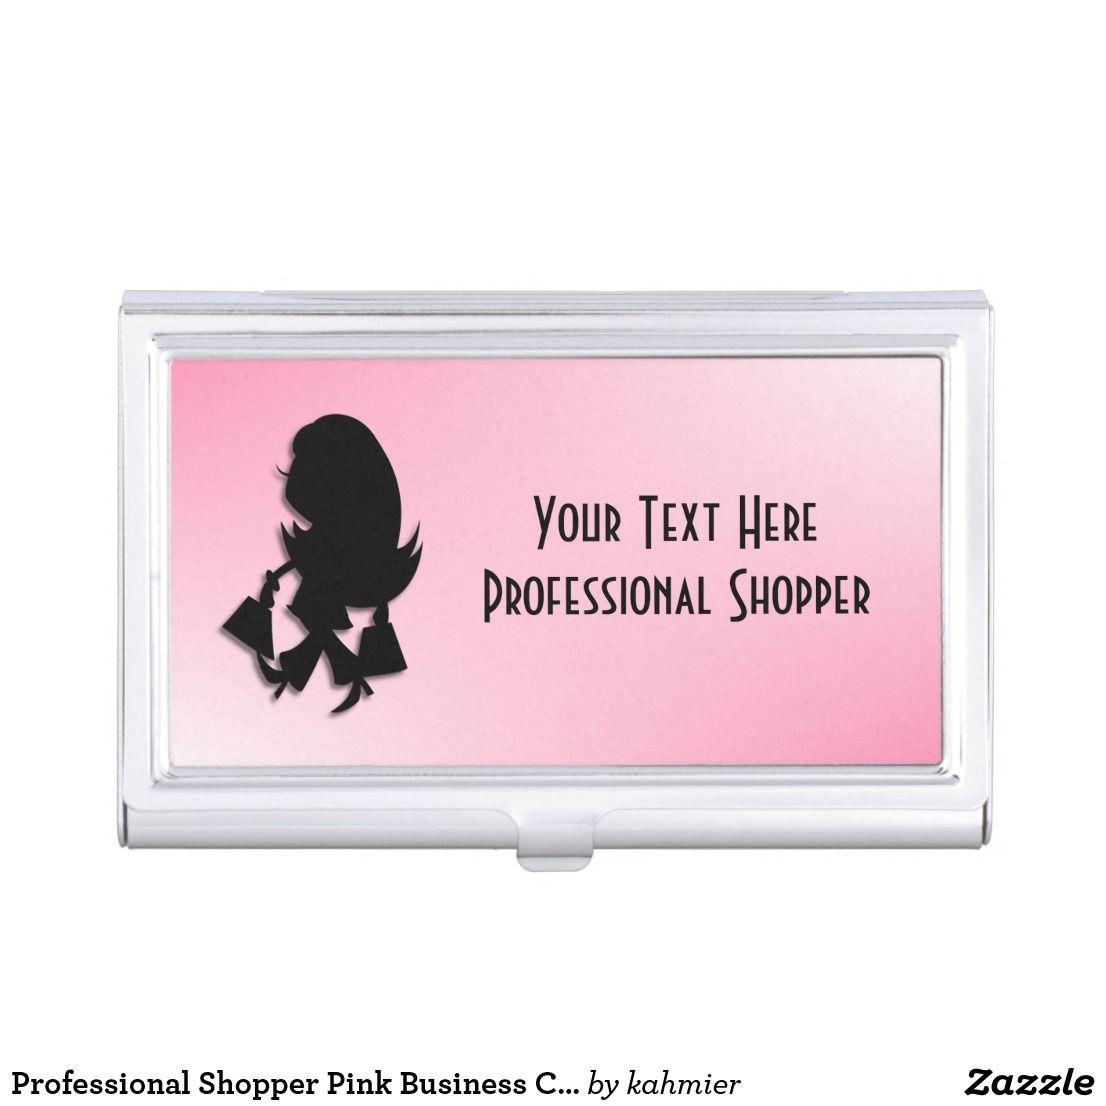 Professional Shopper Pink Business Card Case | Business card case ...